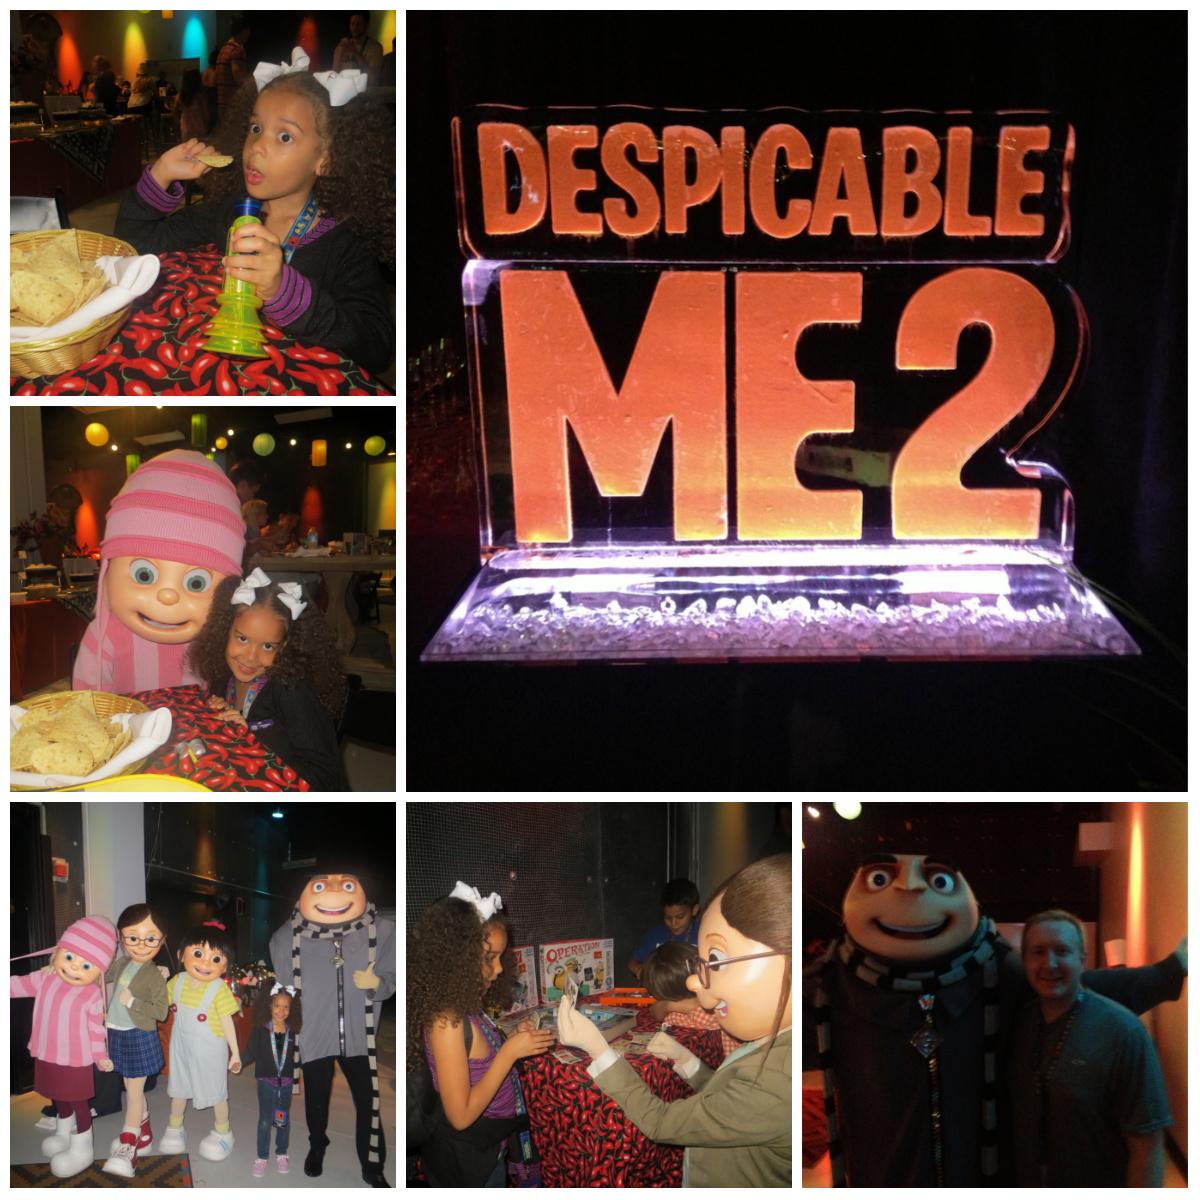 despicable me, daddy-daughter, #dm, #dm2, #despicableme, minion, #minion, universal, #universal, gru